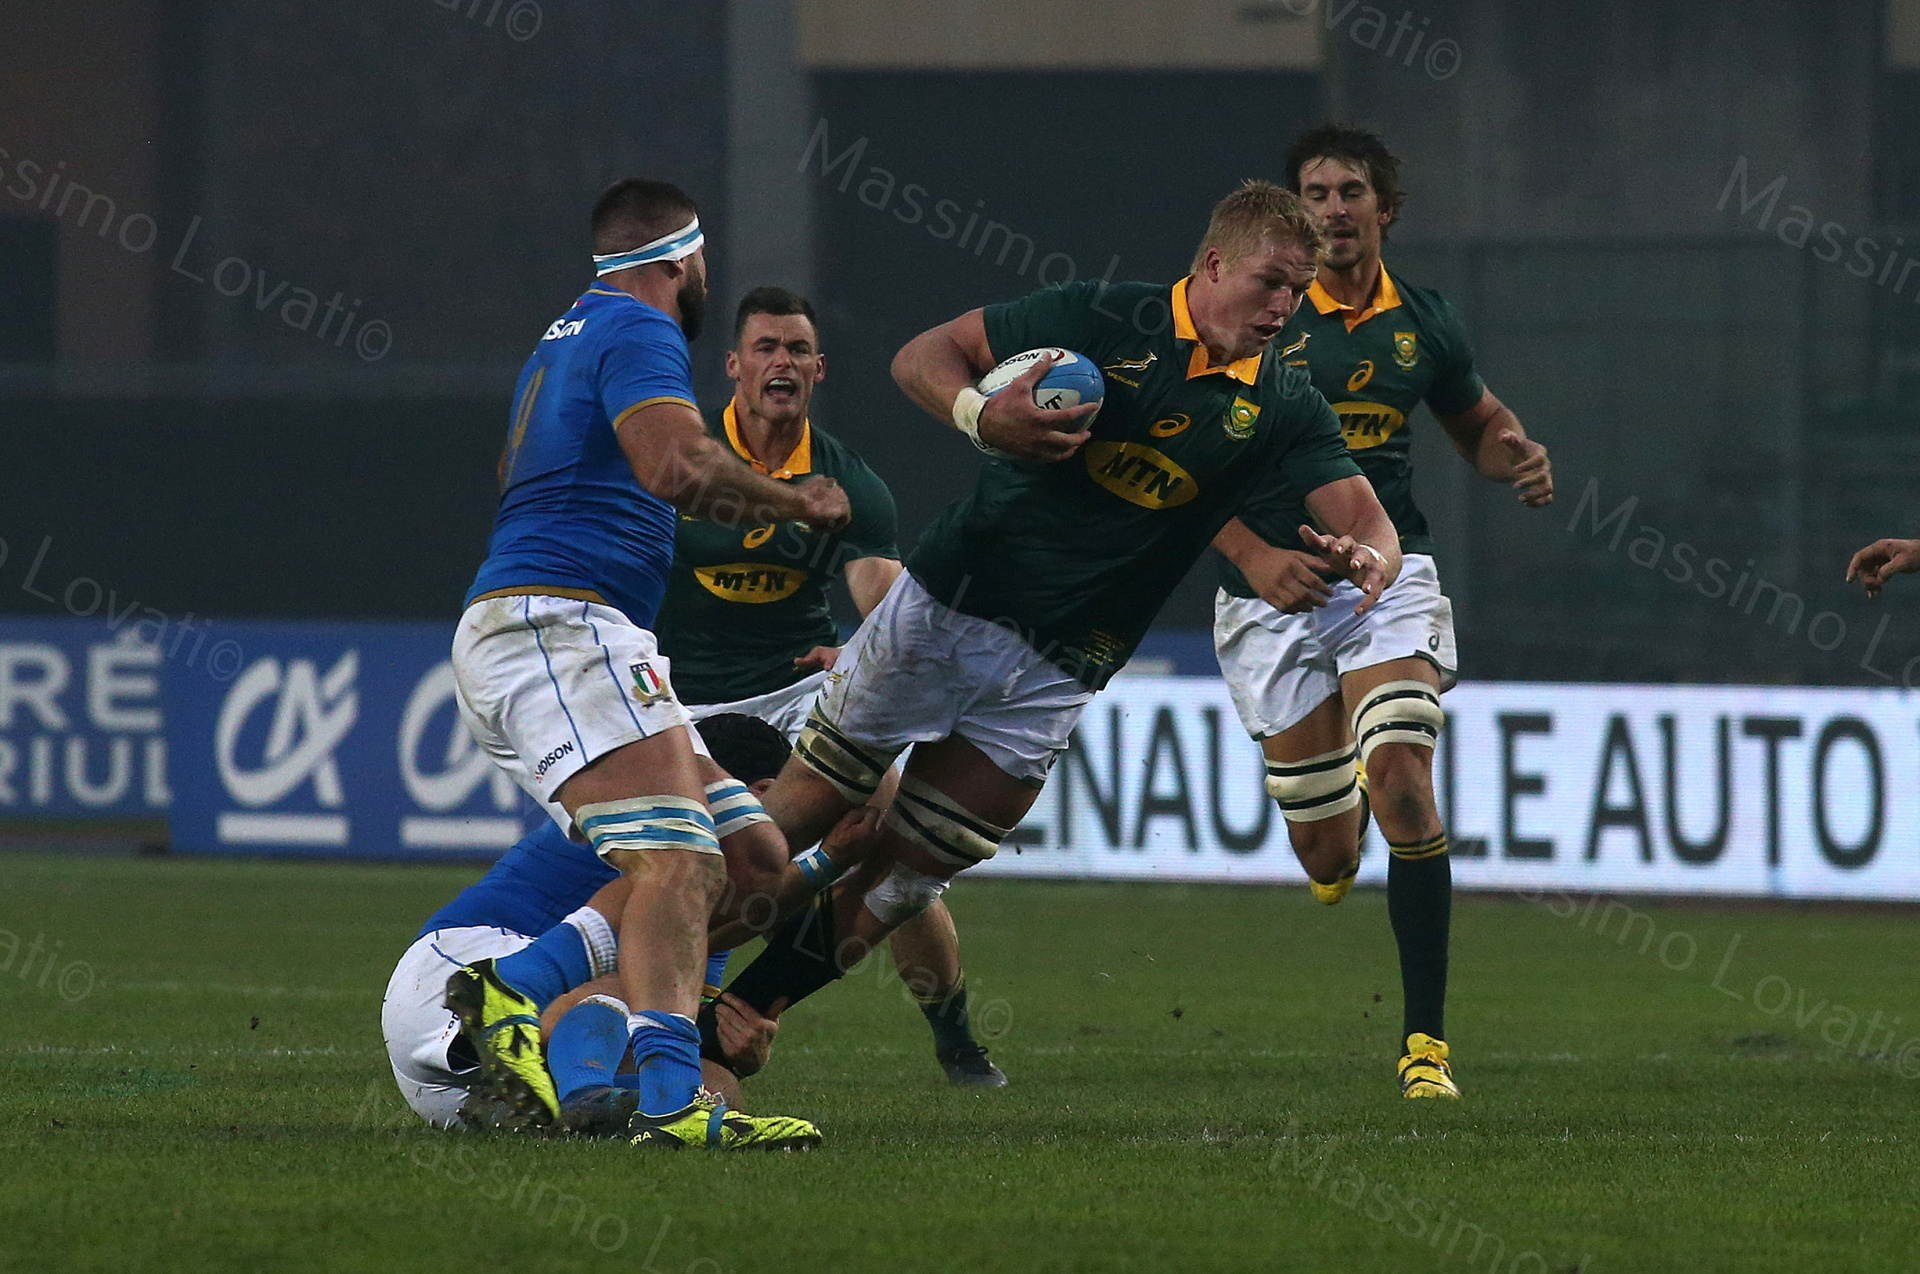 25/11/2017 Padova Rugby Test Match Italia - Sudafrica, nella foto Du Pieter_Steph Du Toit